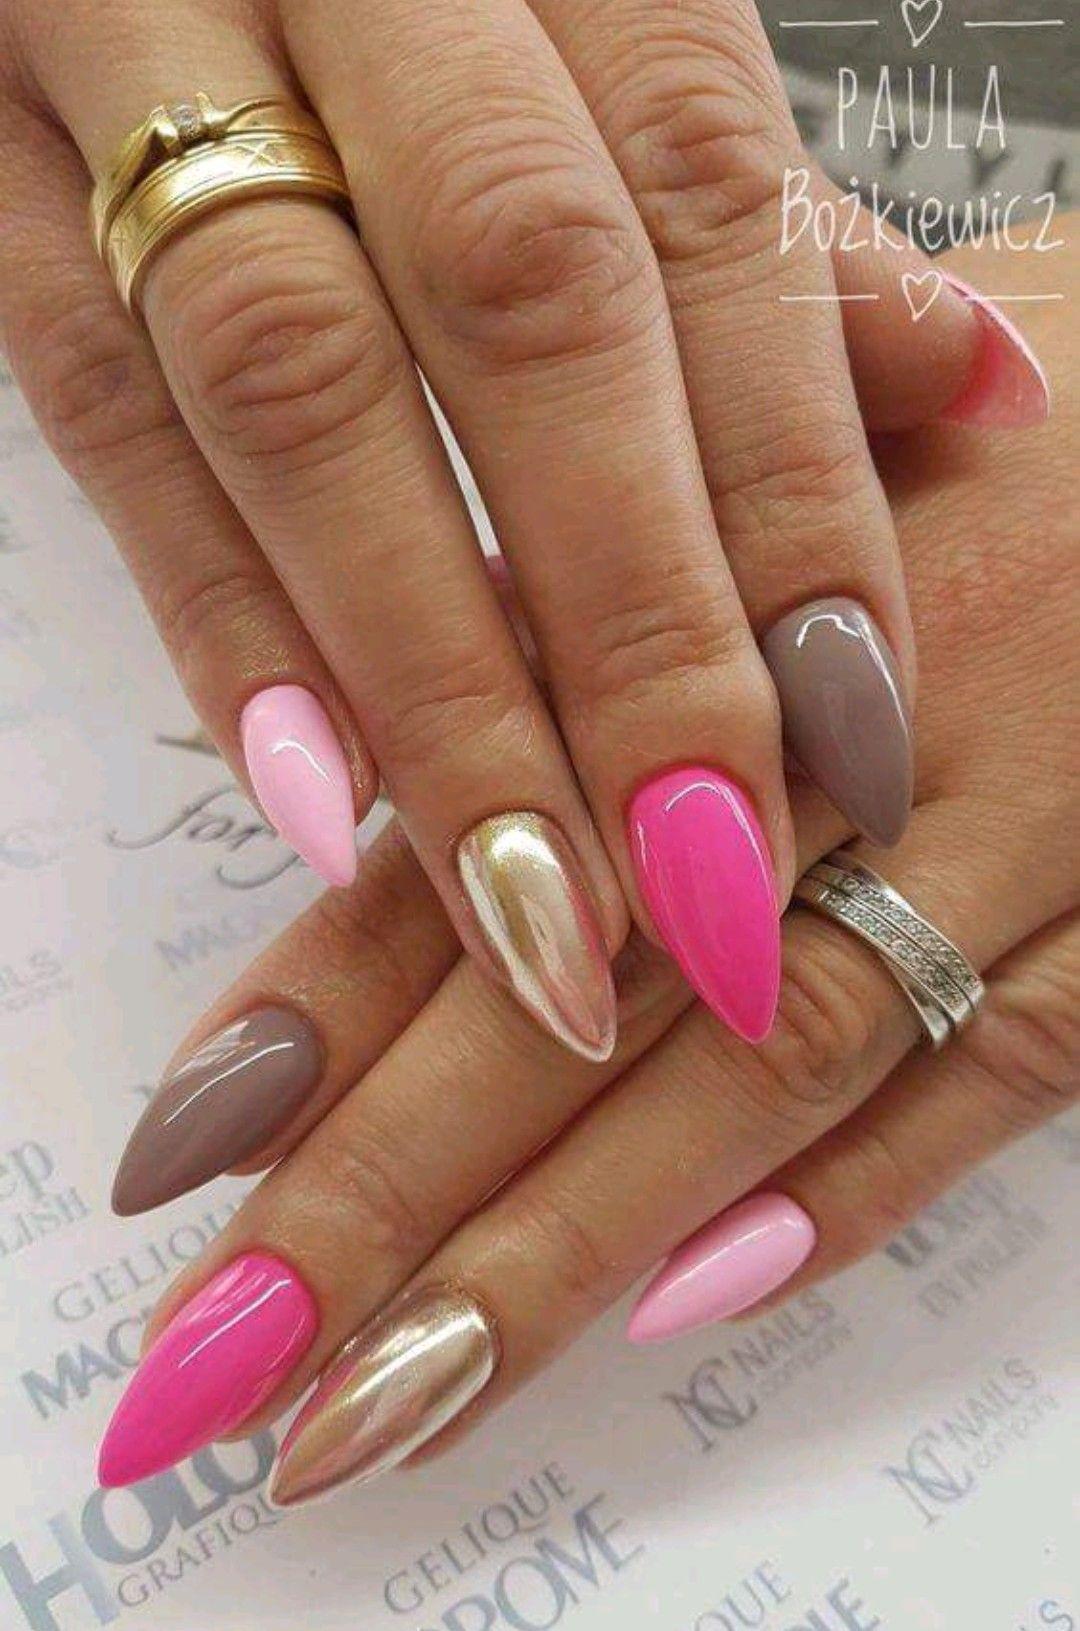 Pin By Pavla Spakova On Beauty Barevne Nehty Gelove Nehty Design Nehtu